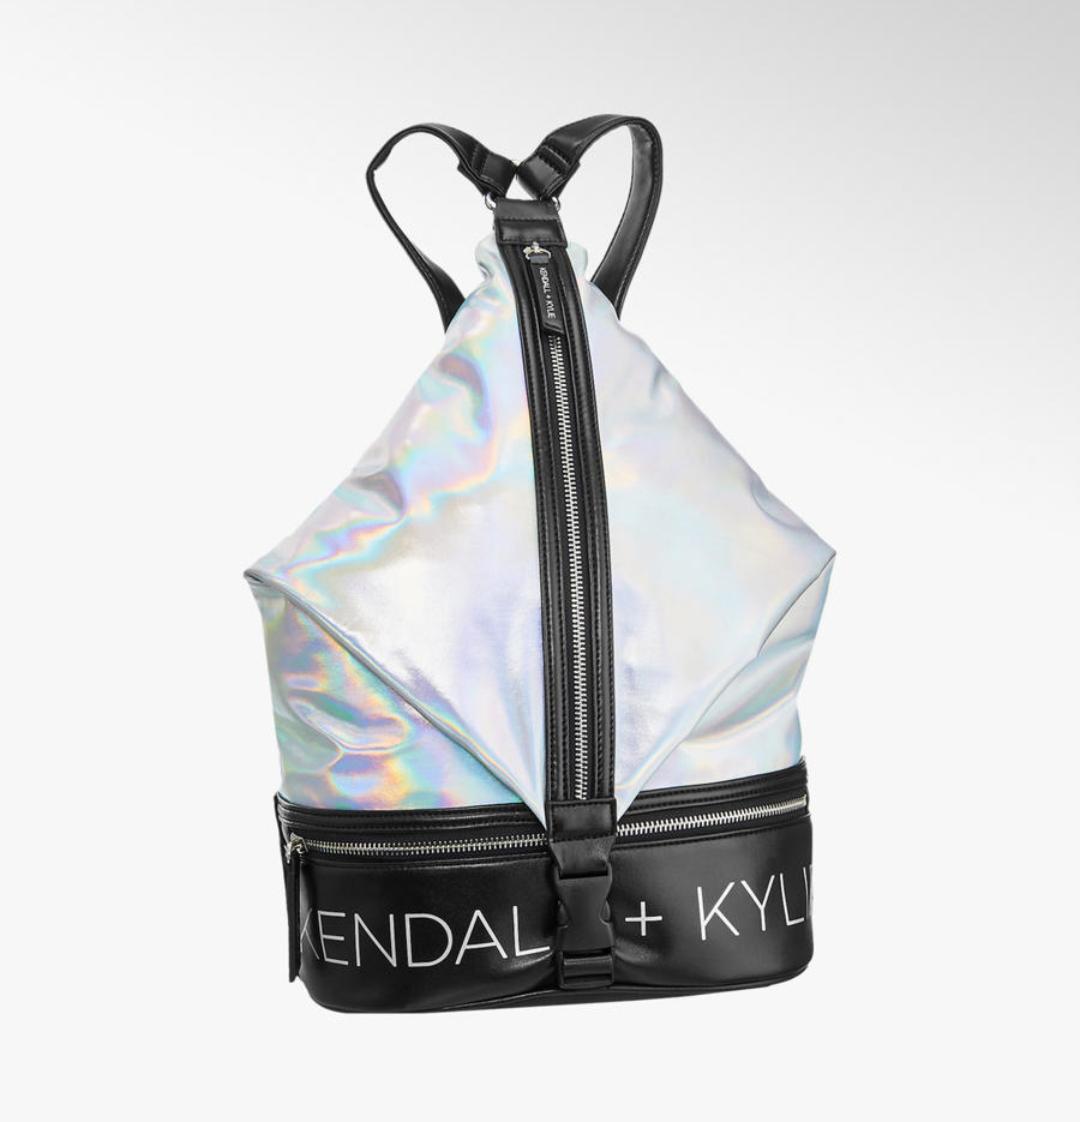 Kendall + Kylie Ladies Metallic Backpack now 17.49 @ Deichmann p&p £1.99